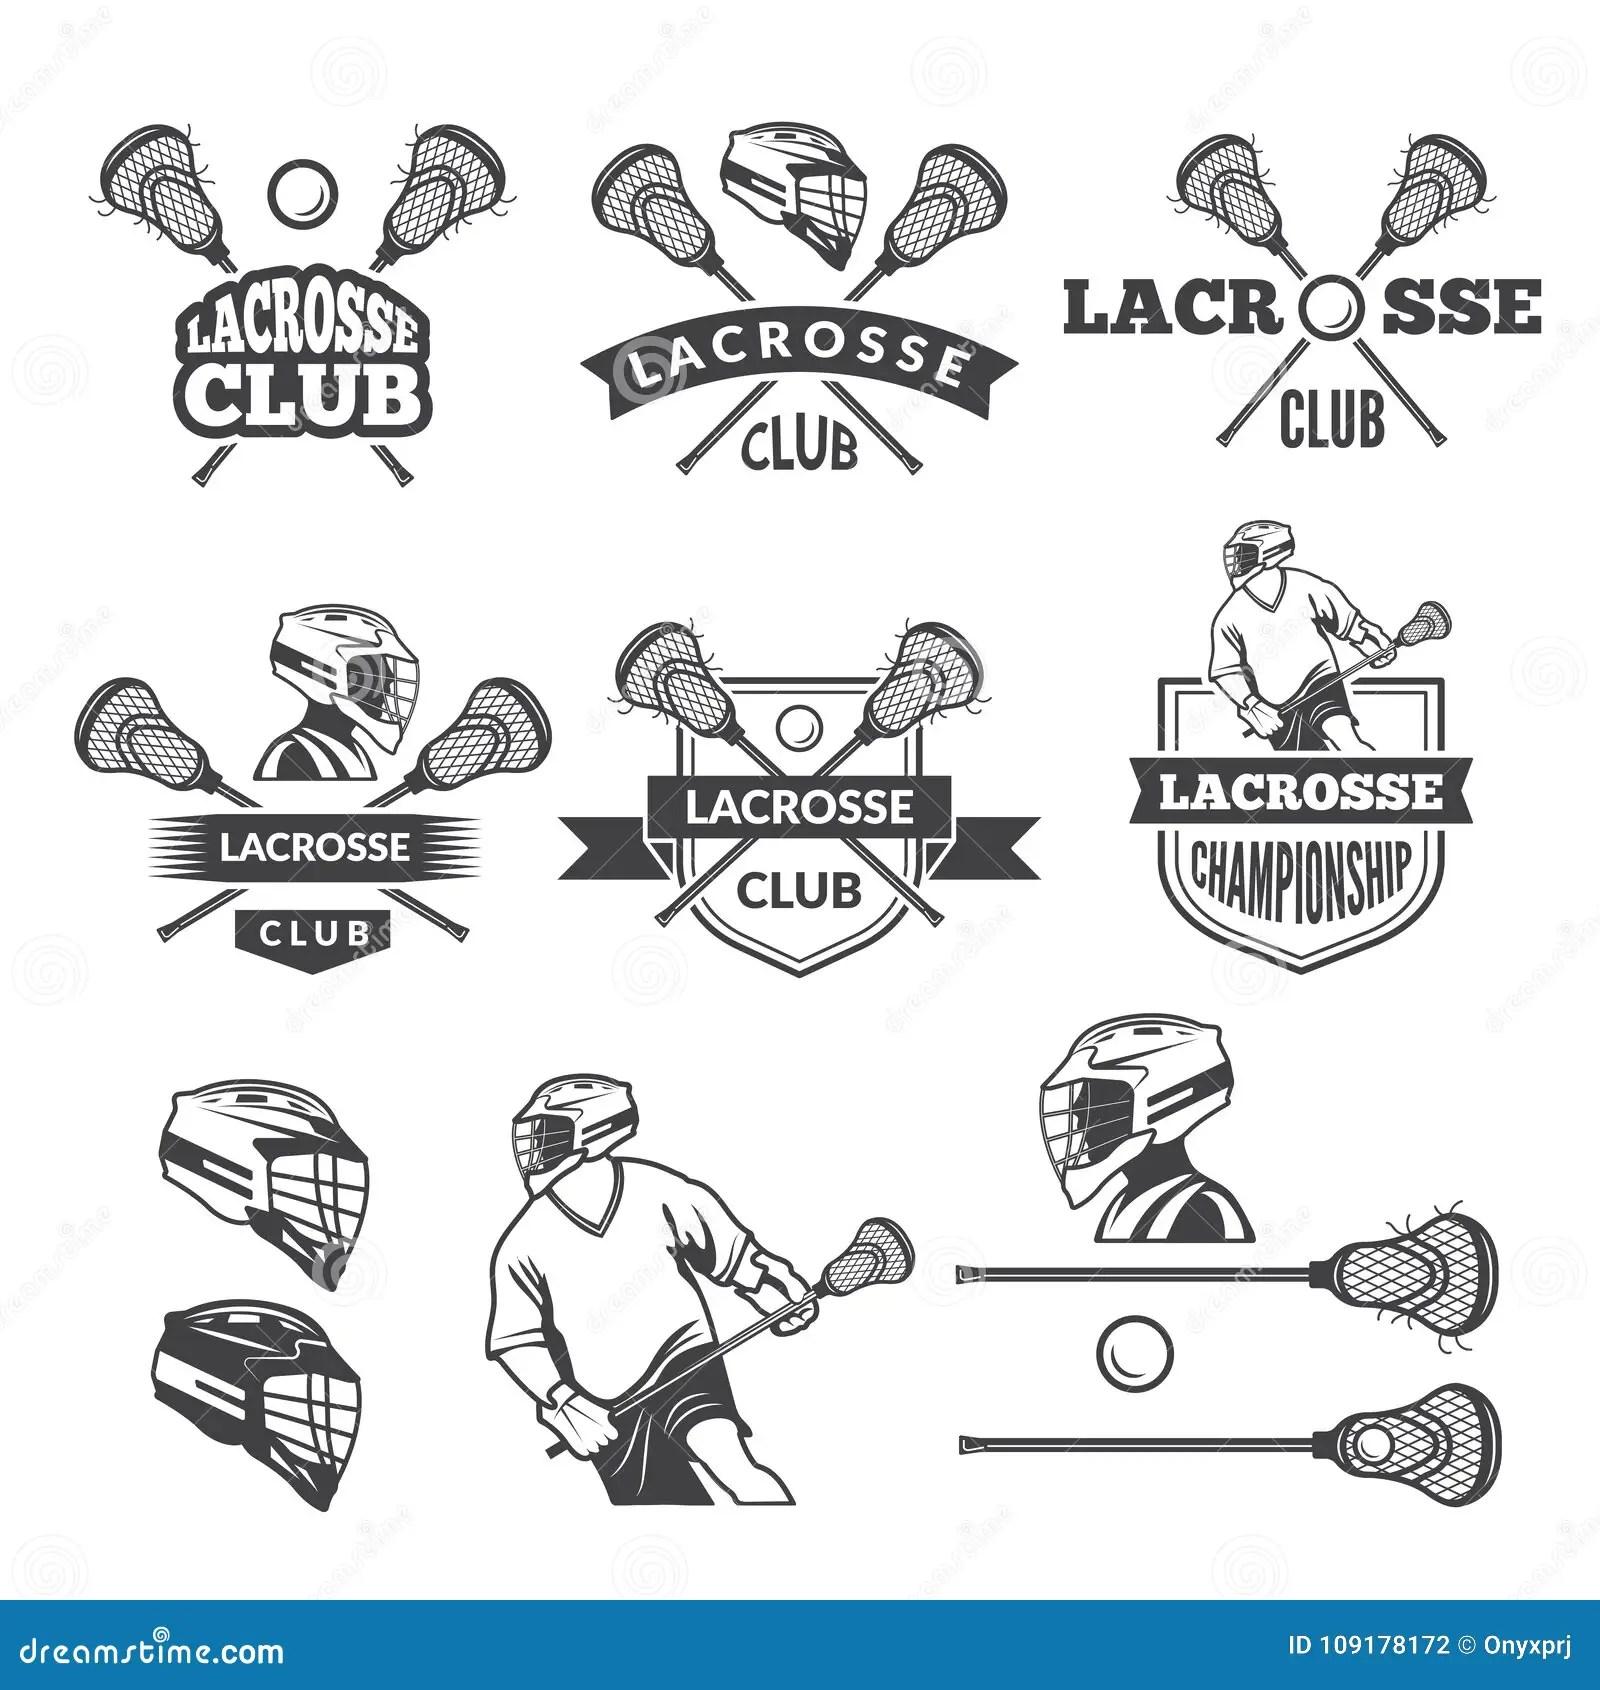 Lacrosse Club Emblem With Head Of Bear Cartoon Vector